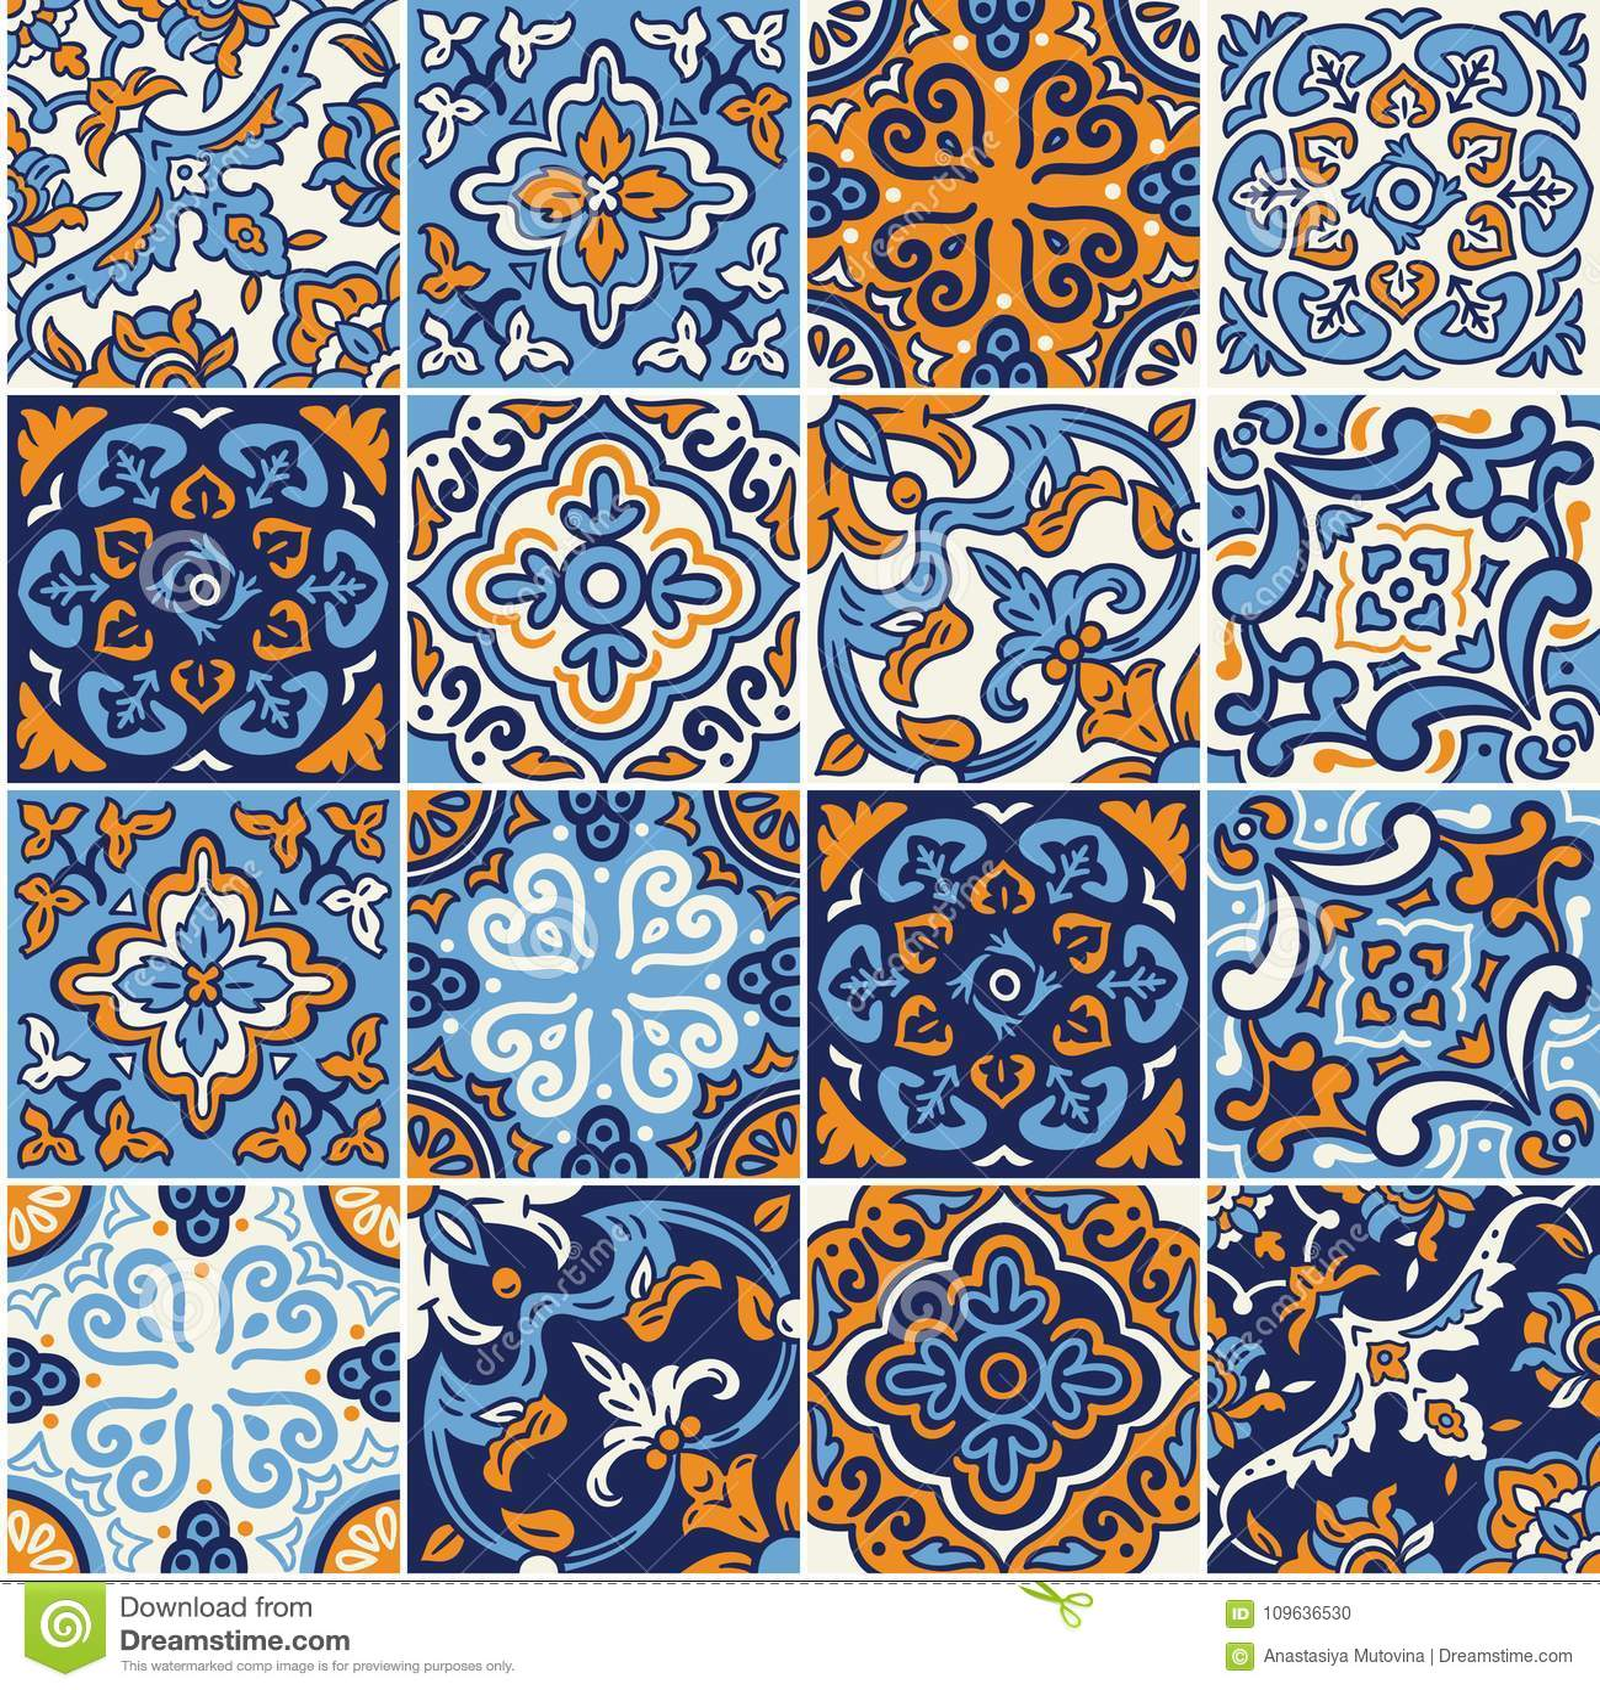 https www dreamstime com ceramic tile colorful patchwork spanish style seamless pattern blue orange colors mosaic ornaments design fashion image109636530